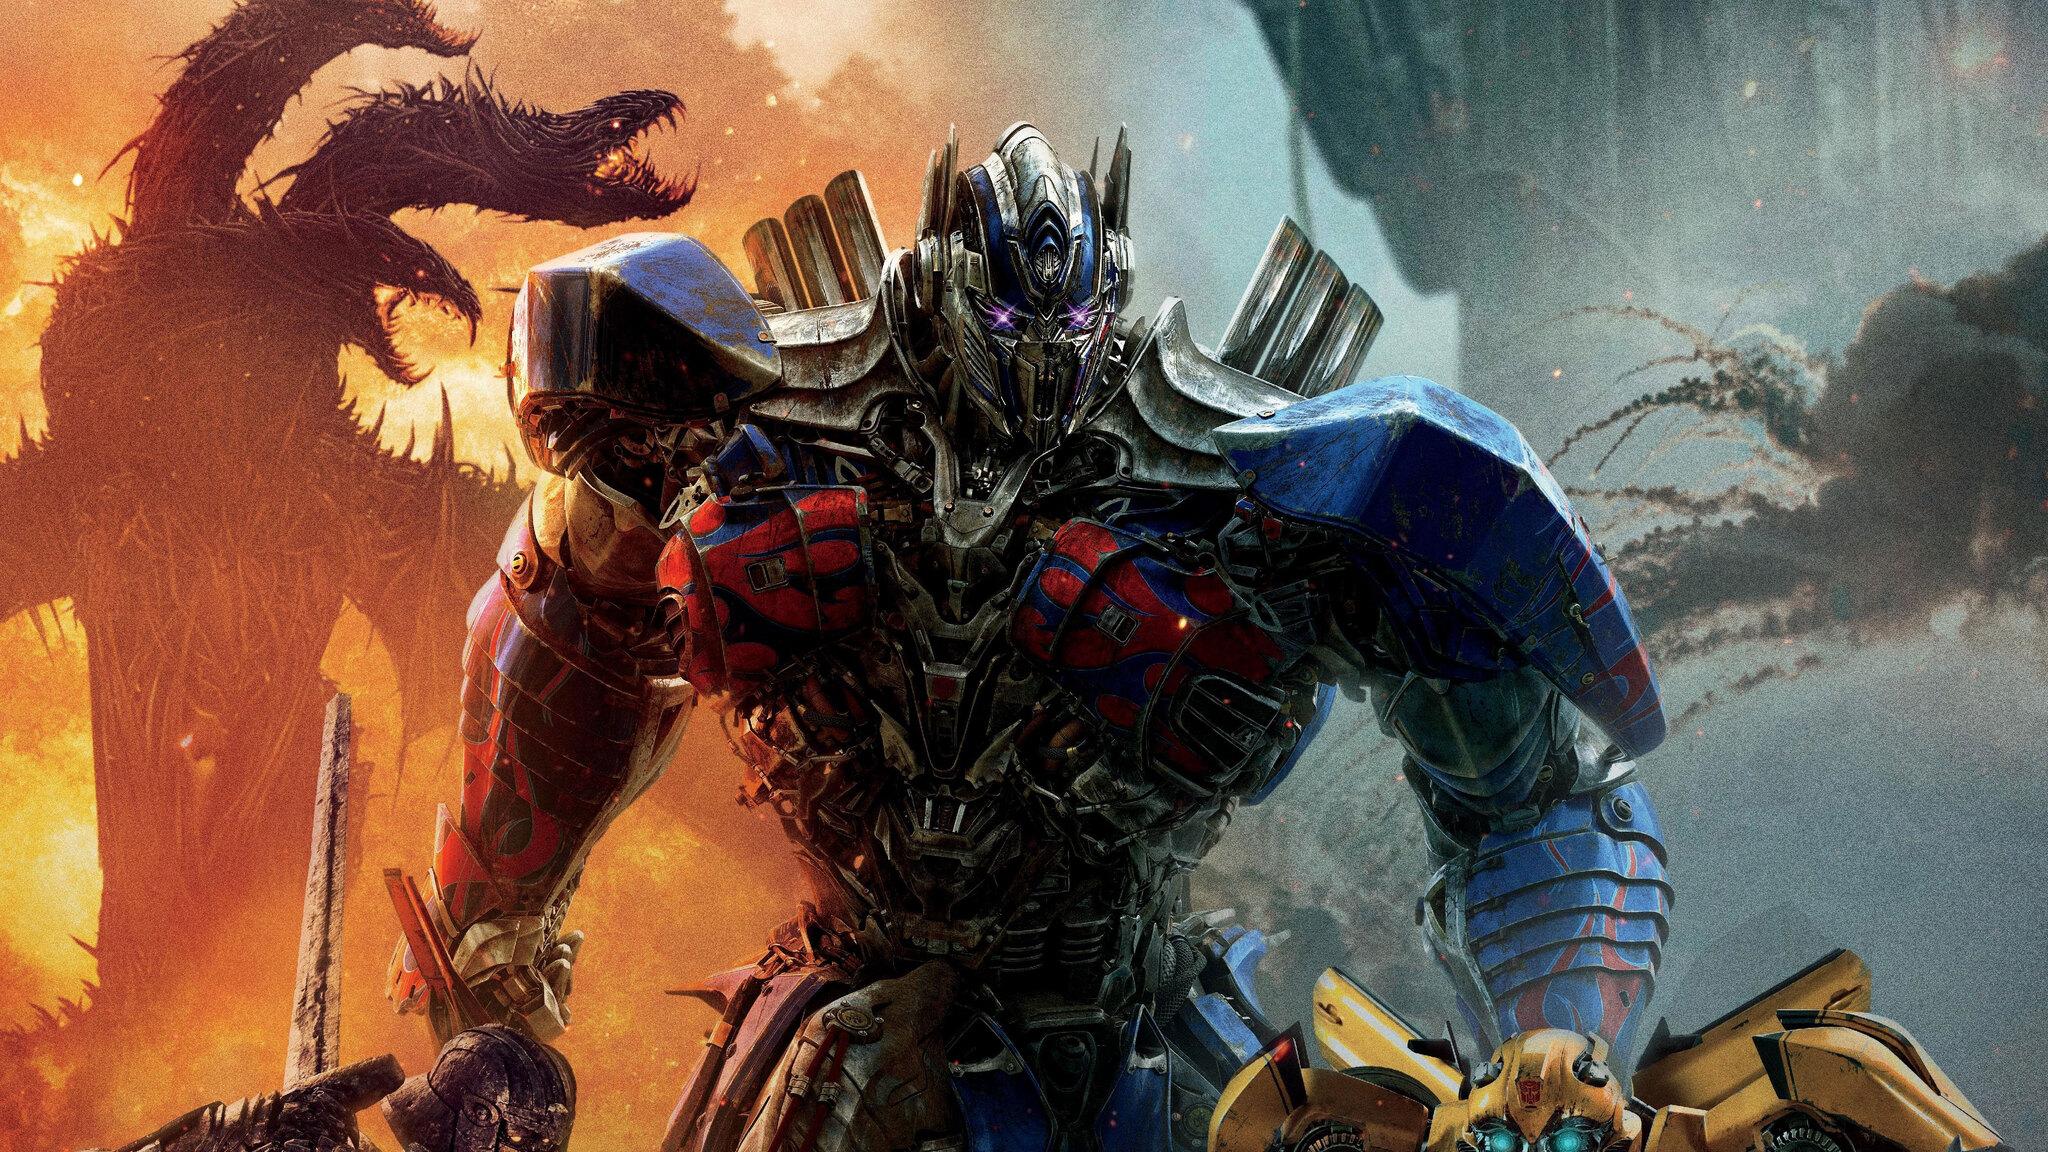 2048x1152 Transformers The Last Knight Optimus Prime 4k 2048x1152